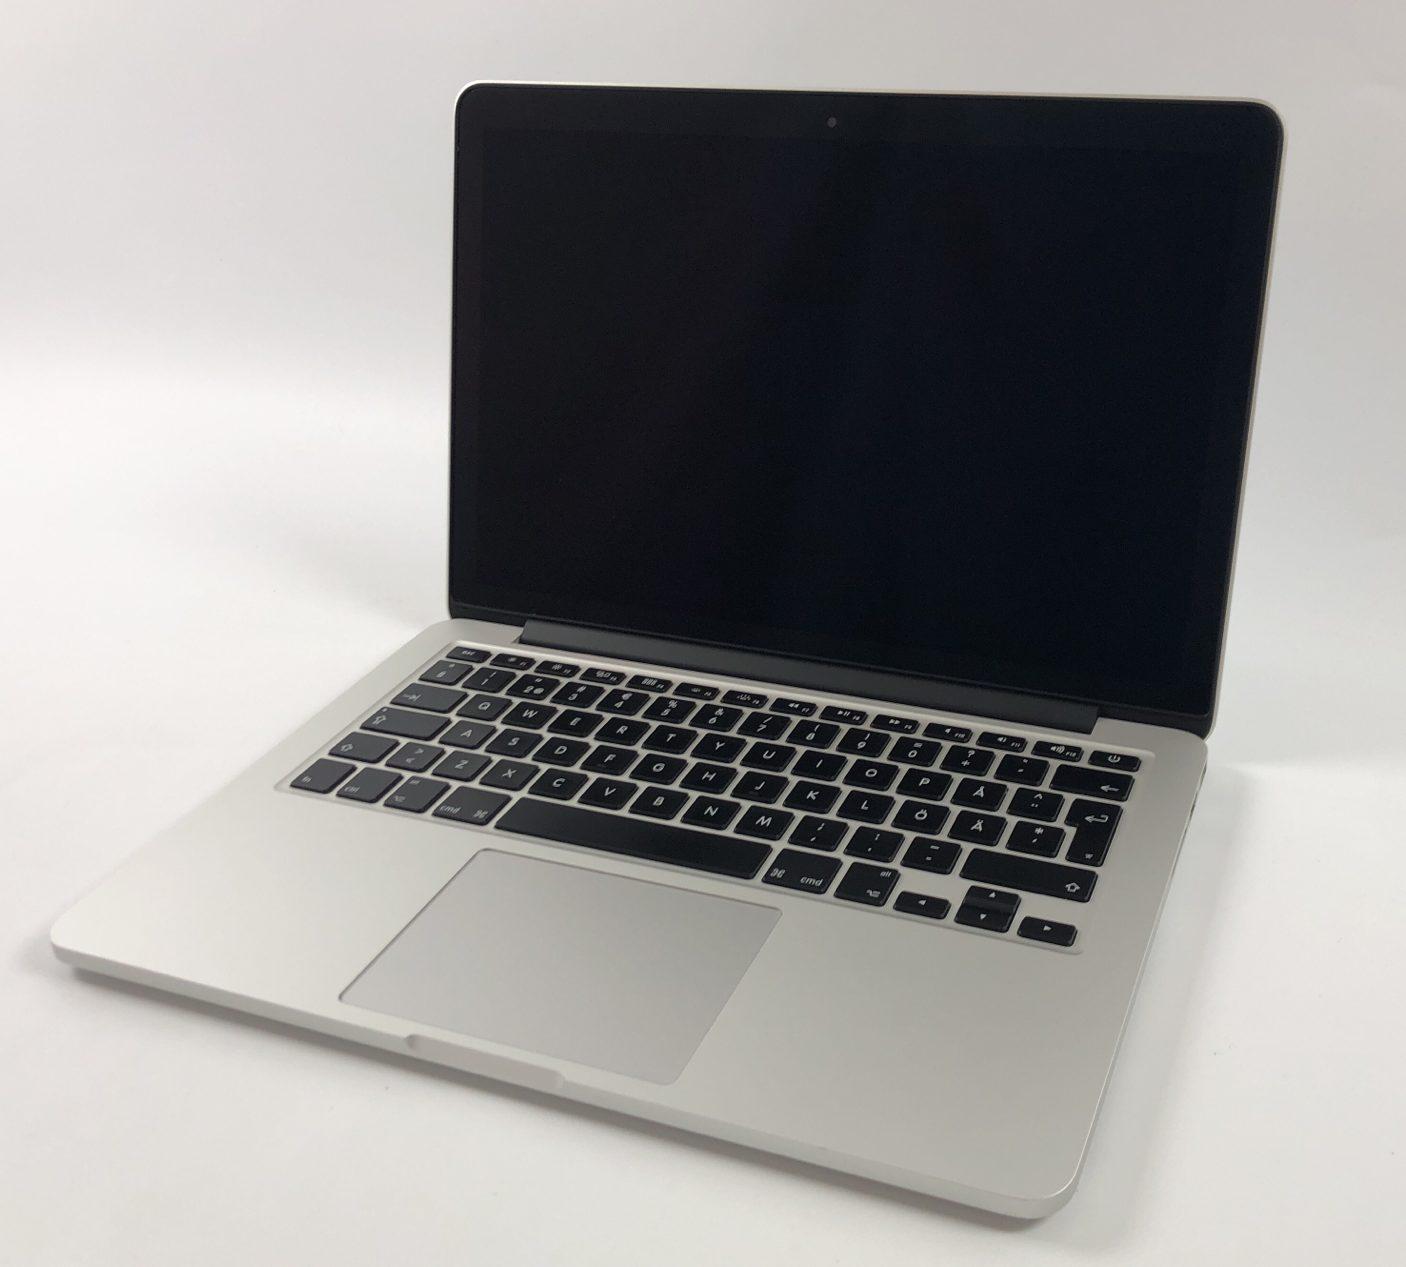 "MacBook Pro Retina 13"" Mid 2014 (Intel Core i7 3.0 GHz 16 GB RAM 512 GB SSD), Intel Core i7 3.0 GHz, 16 GB RAM, 512 GB SSD, bild 1"